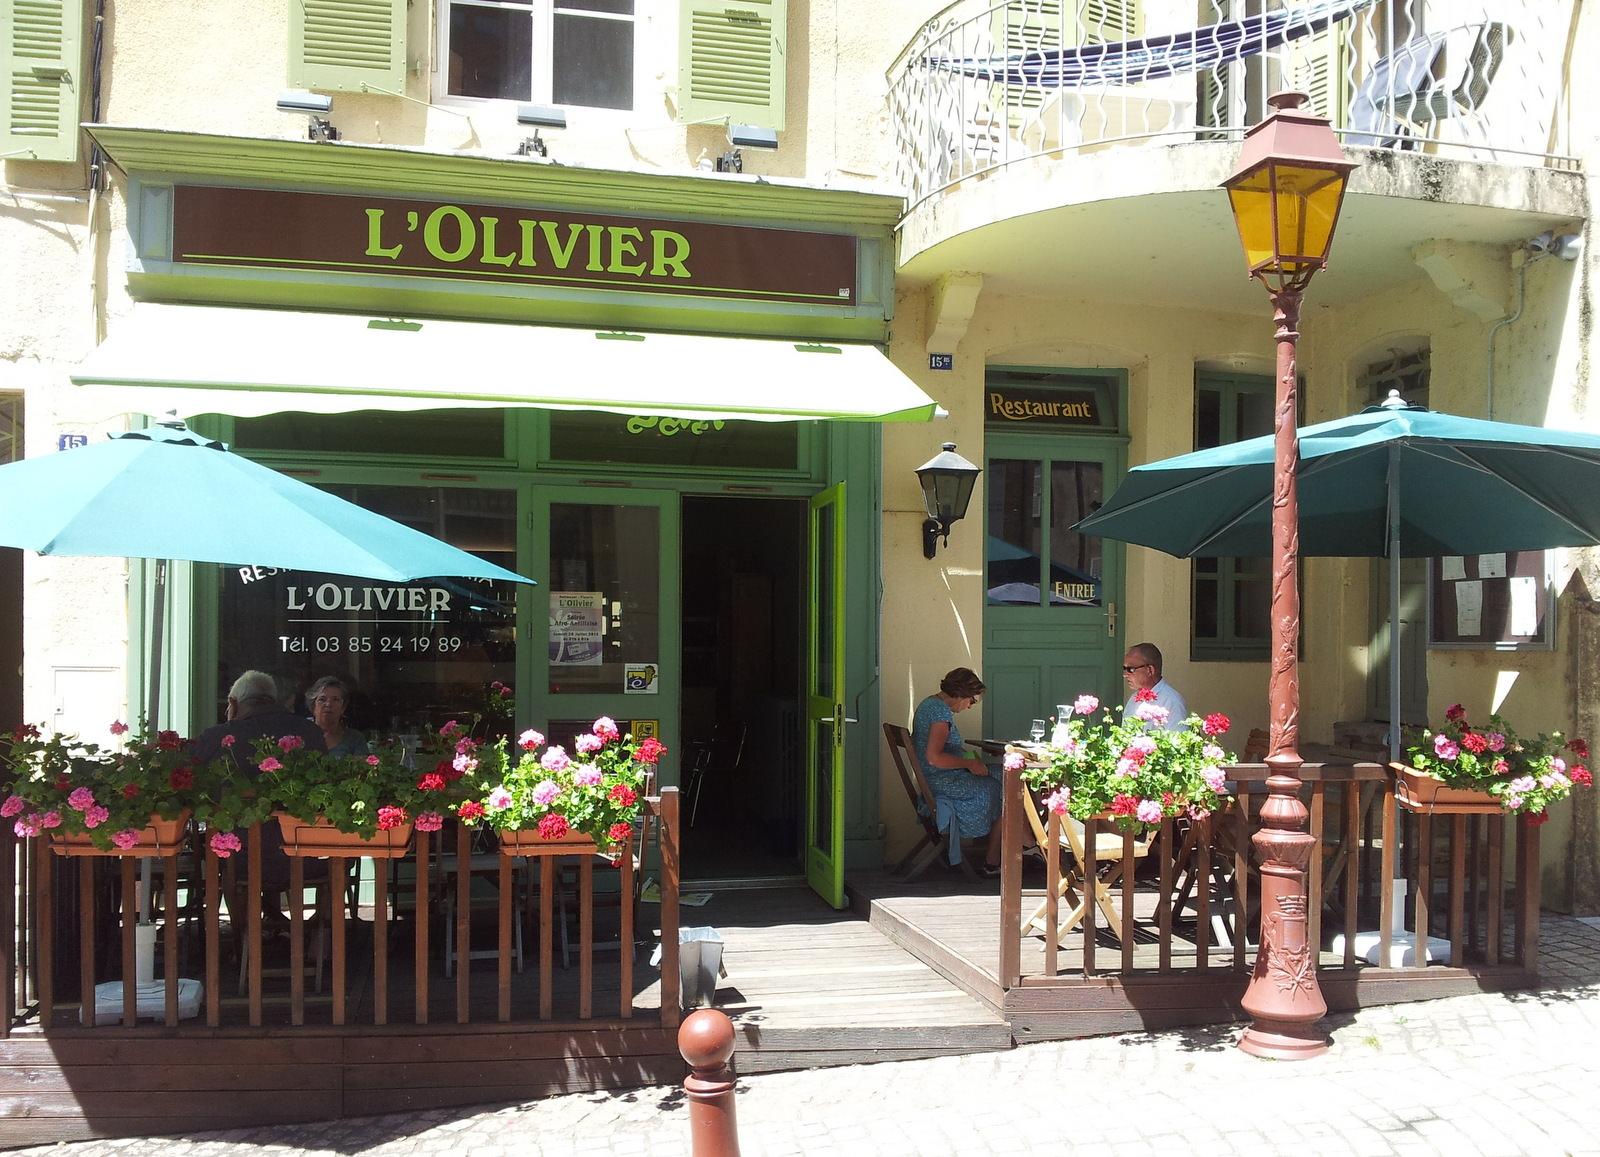 L'Olivier Restaurant in Charolles